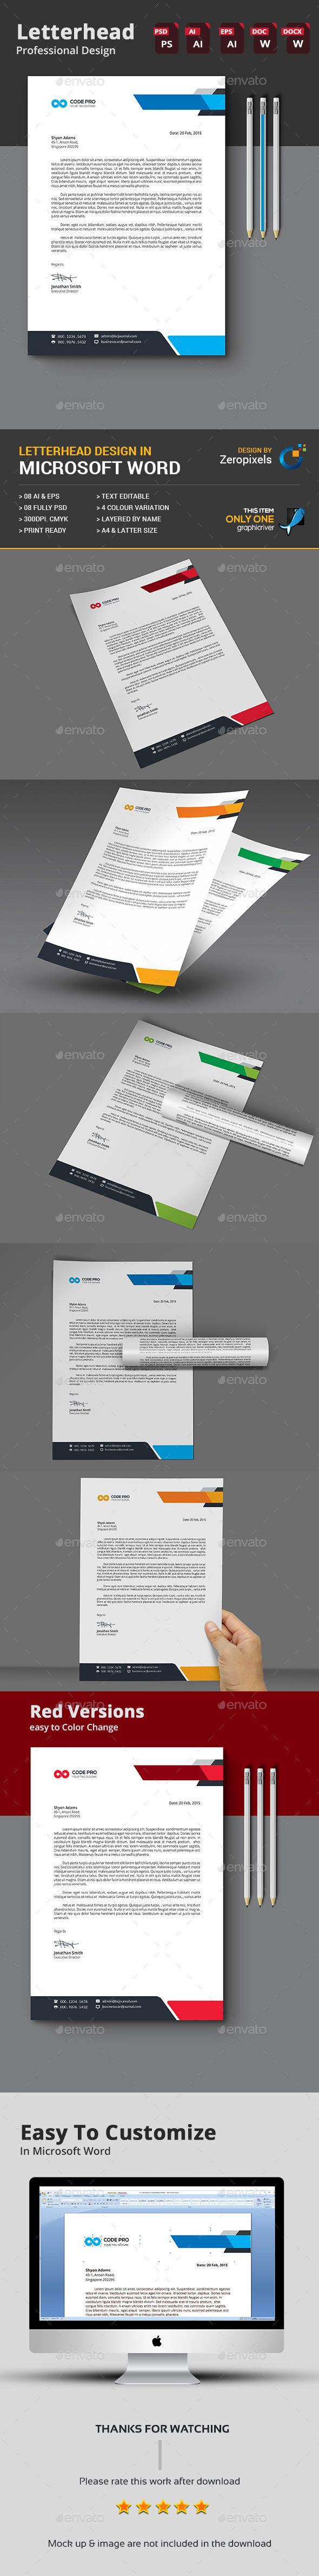 Letterhead Design Template PSD, Vector EPS, AI Illustrator, MS Word